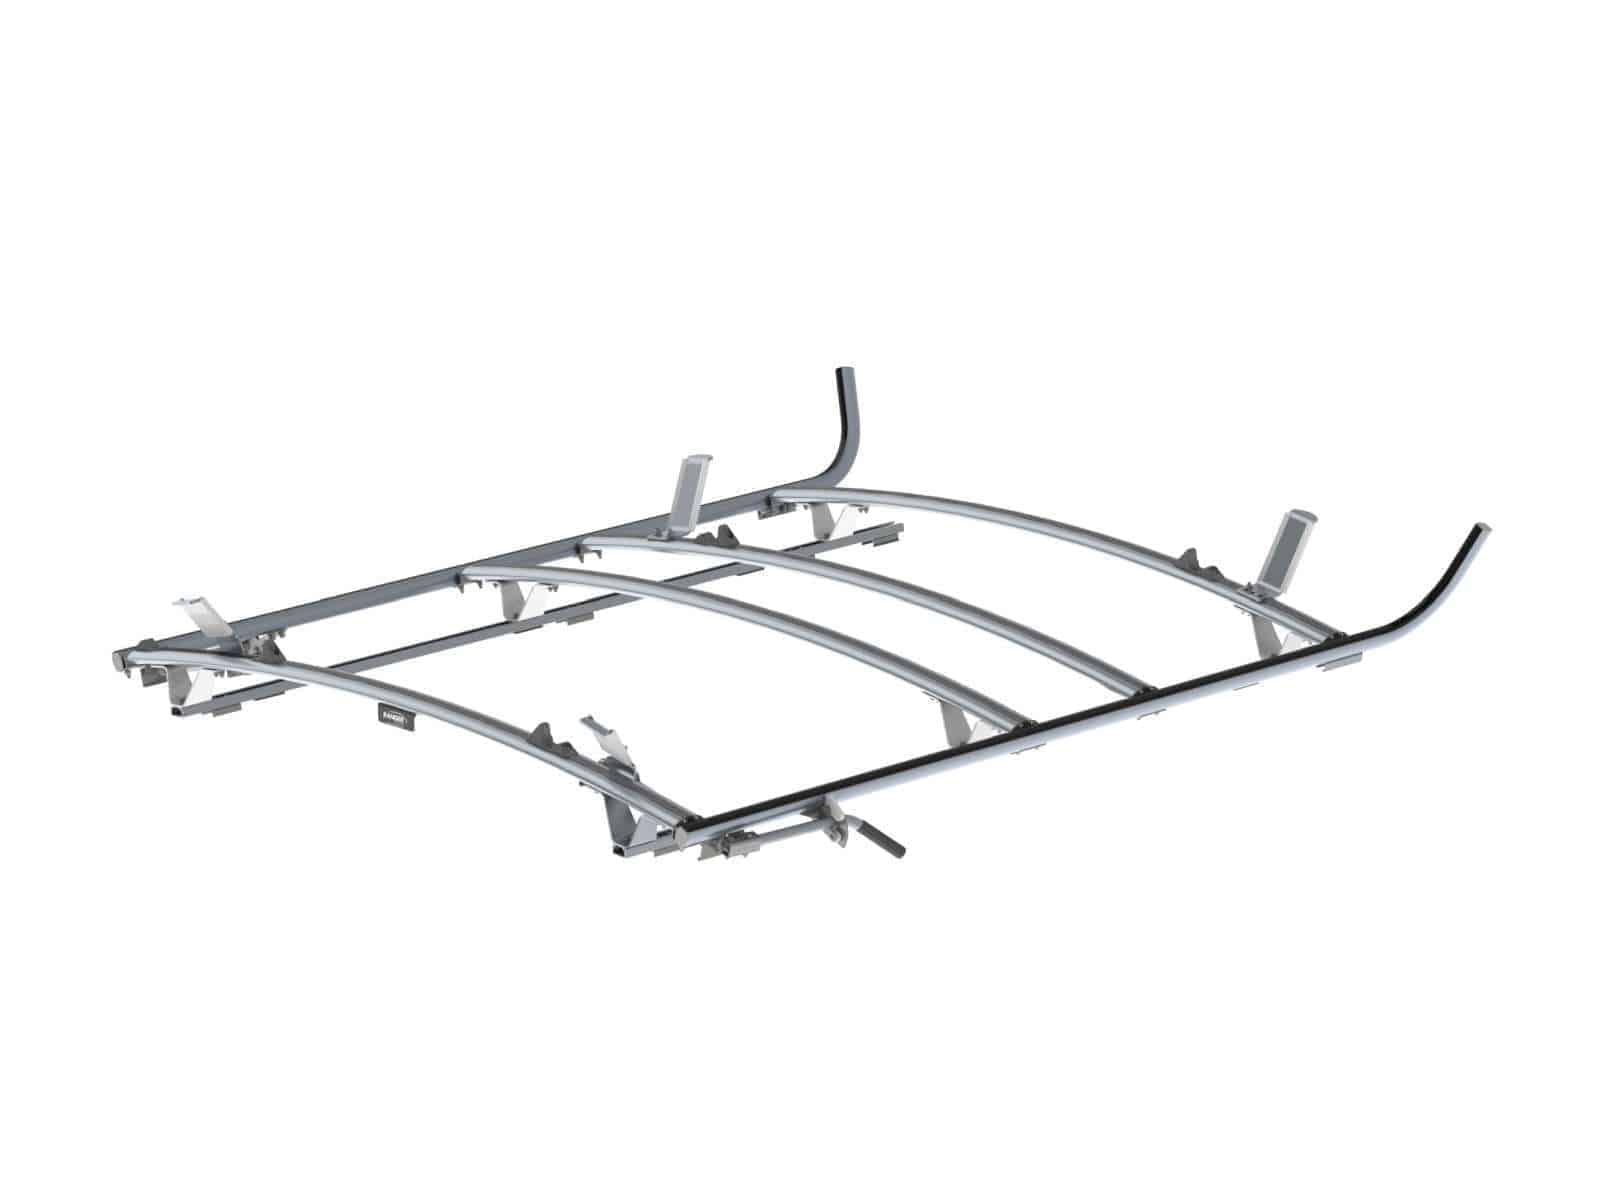 Combination Ladder Rack Aluminum 3 Bar Ram Promaster